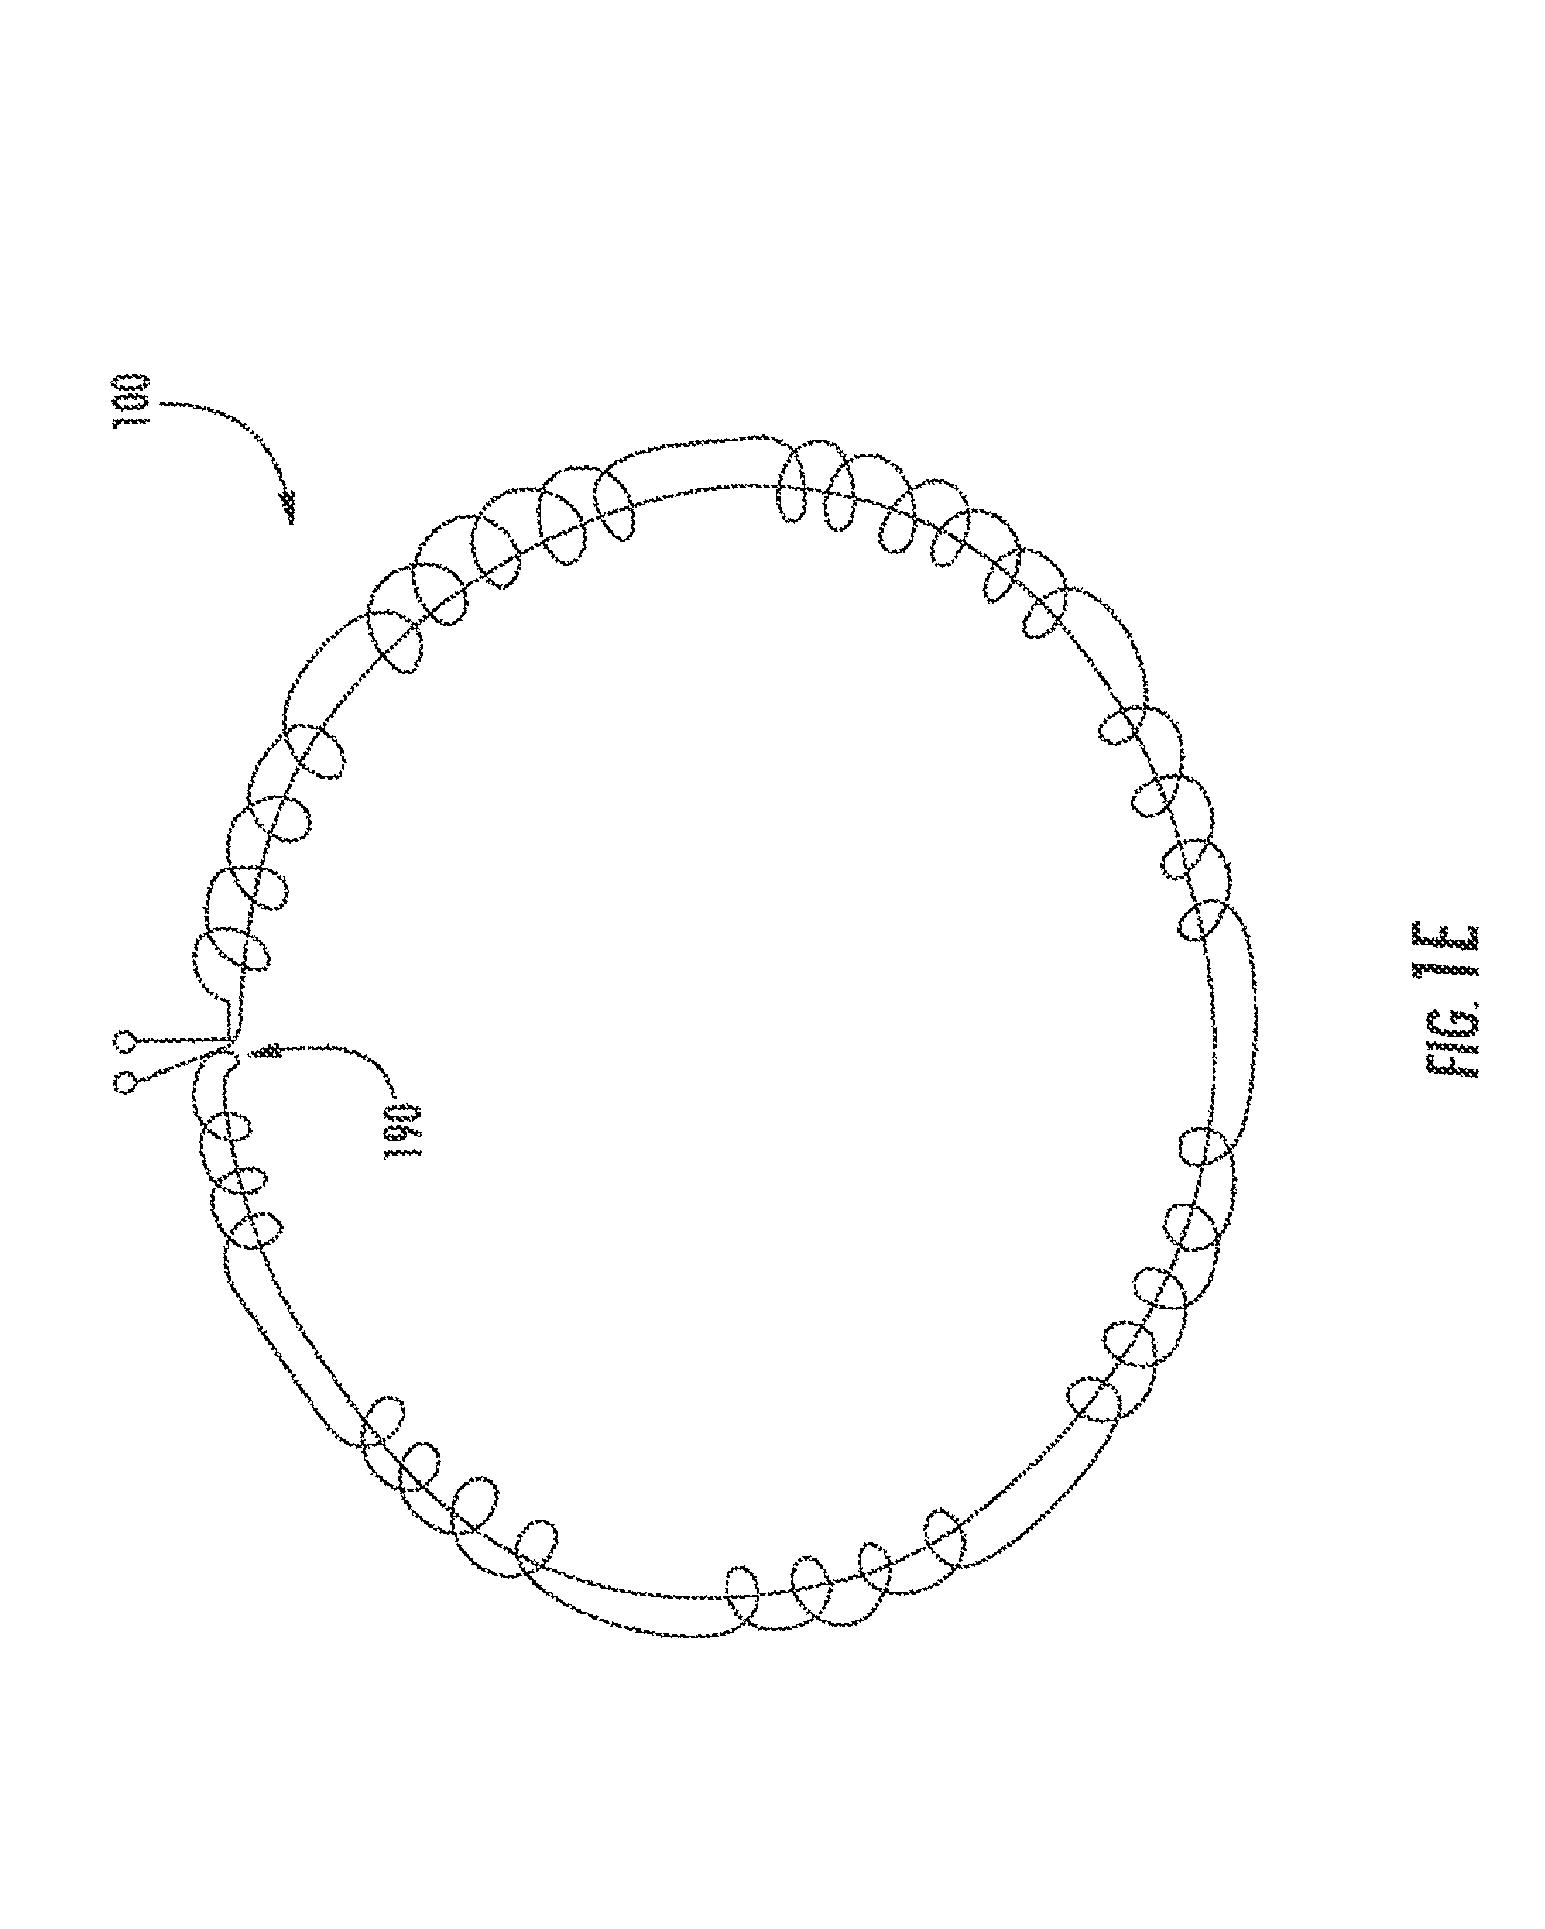 patent us 9 823 274 b2 Magnetek Fan Motor patent